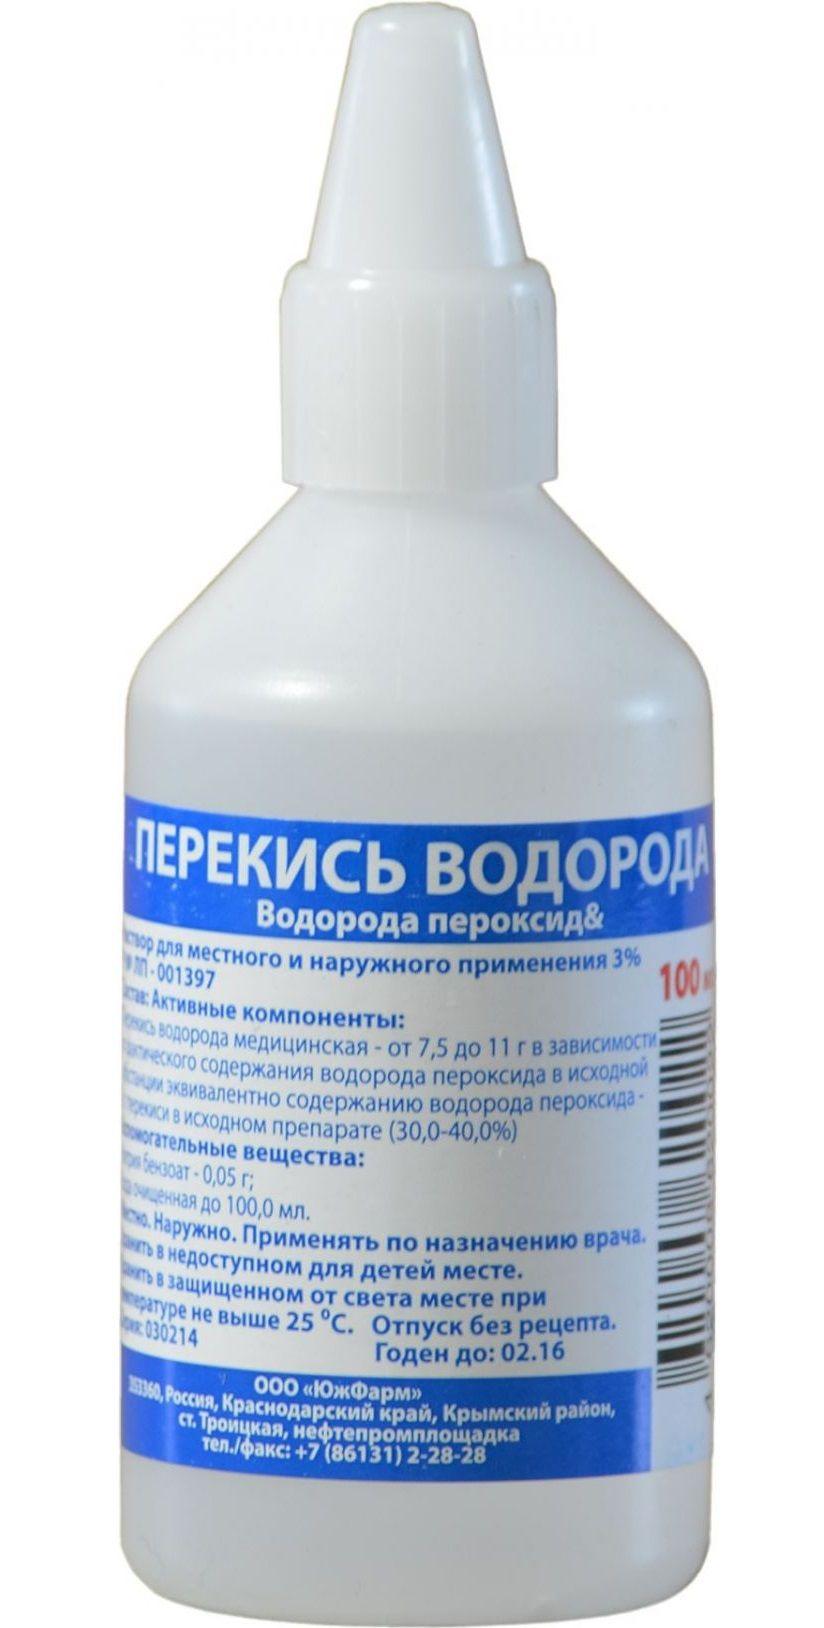 фото упаковки Перекись водорода